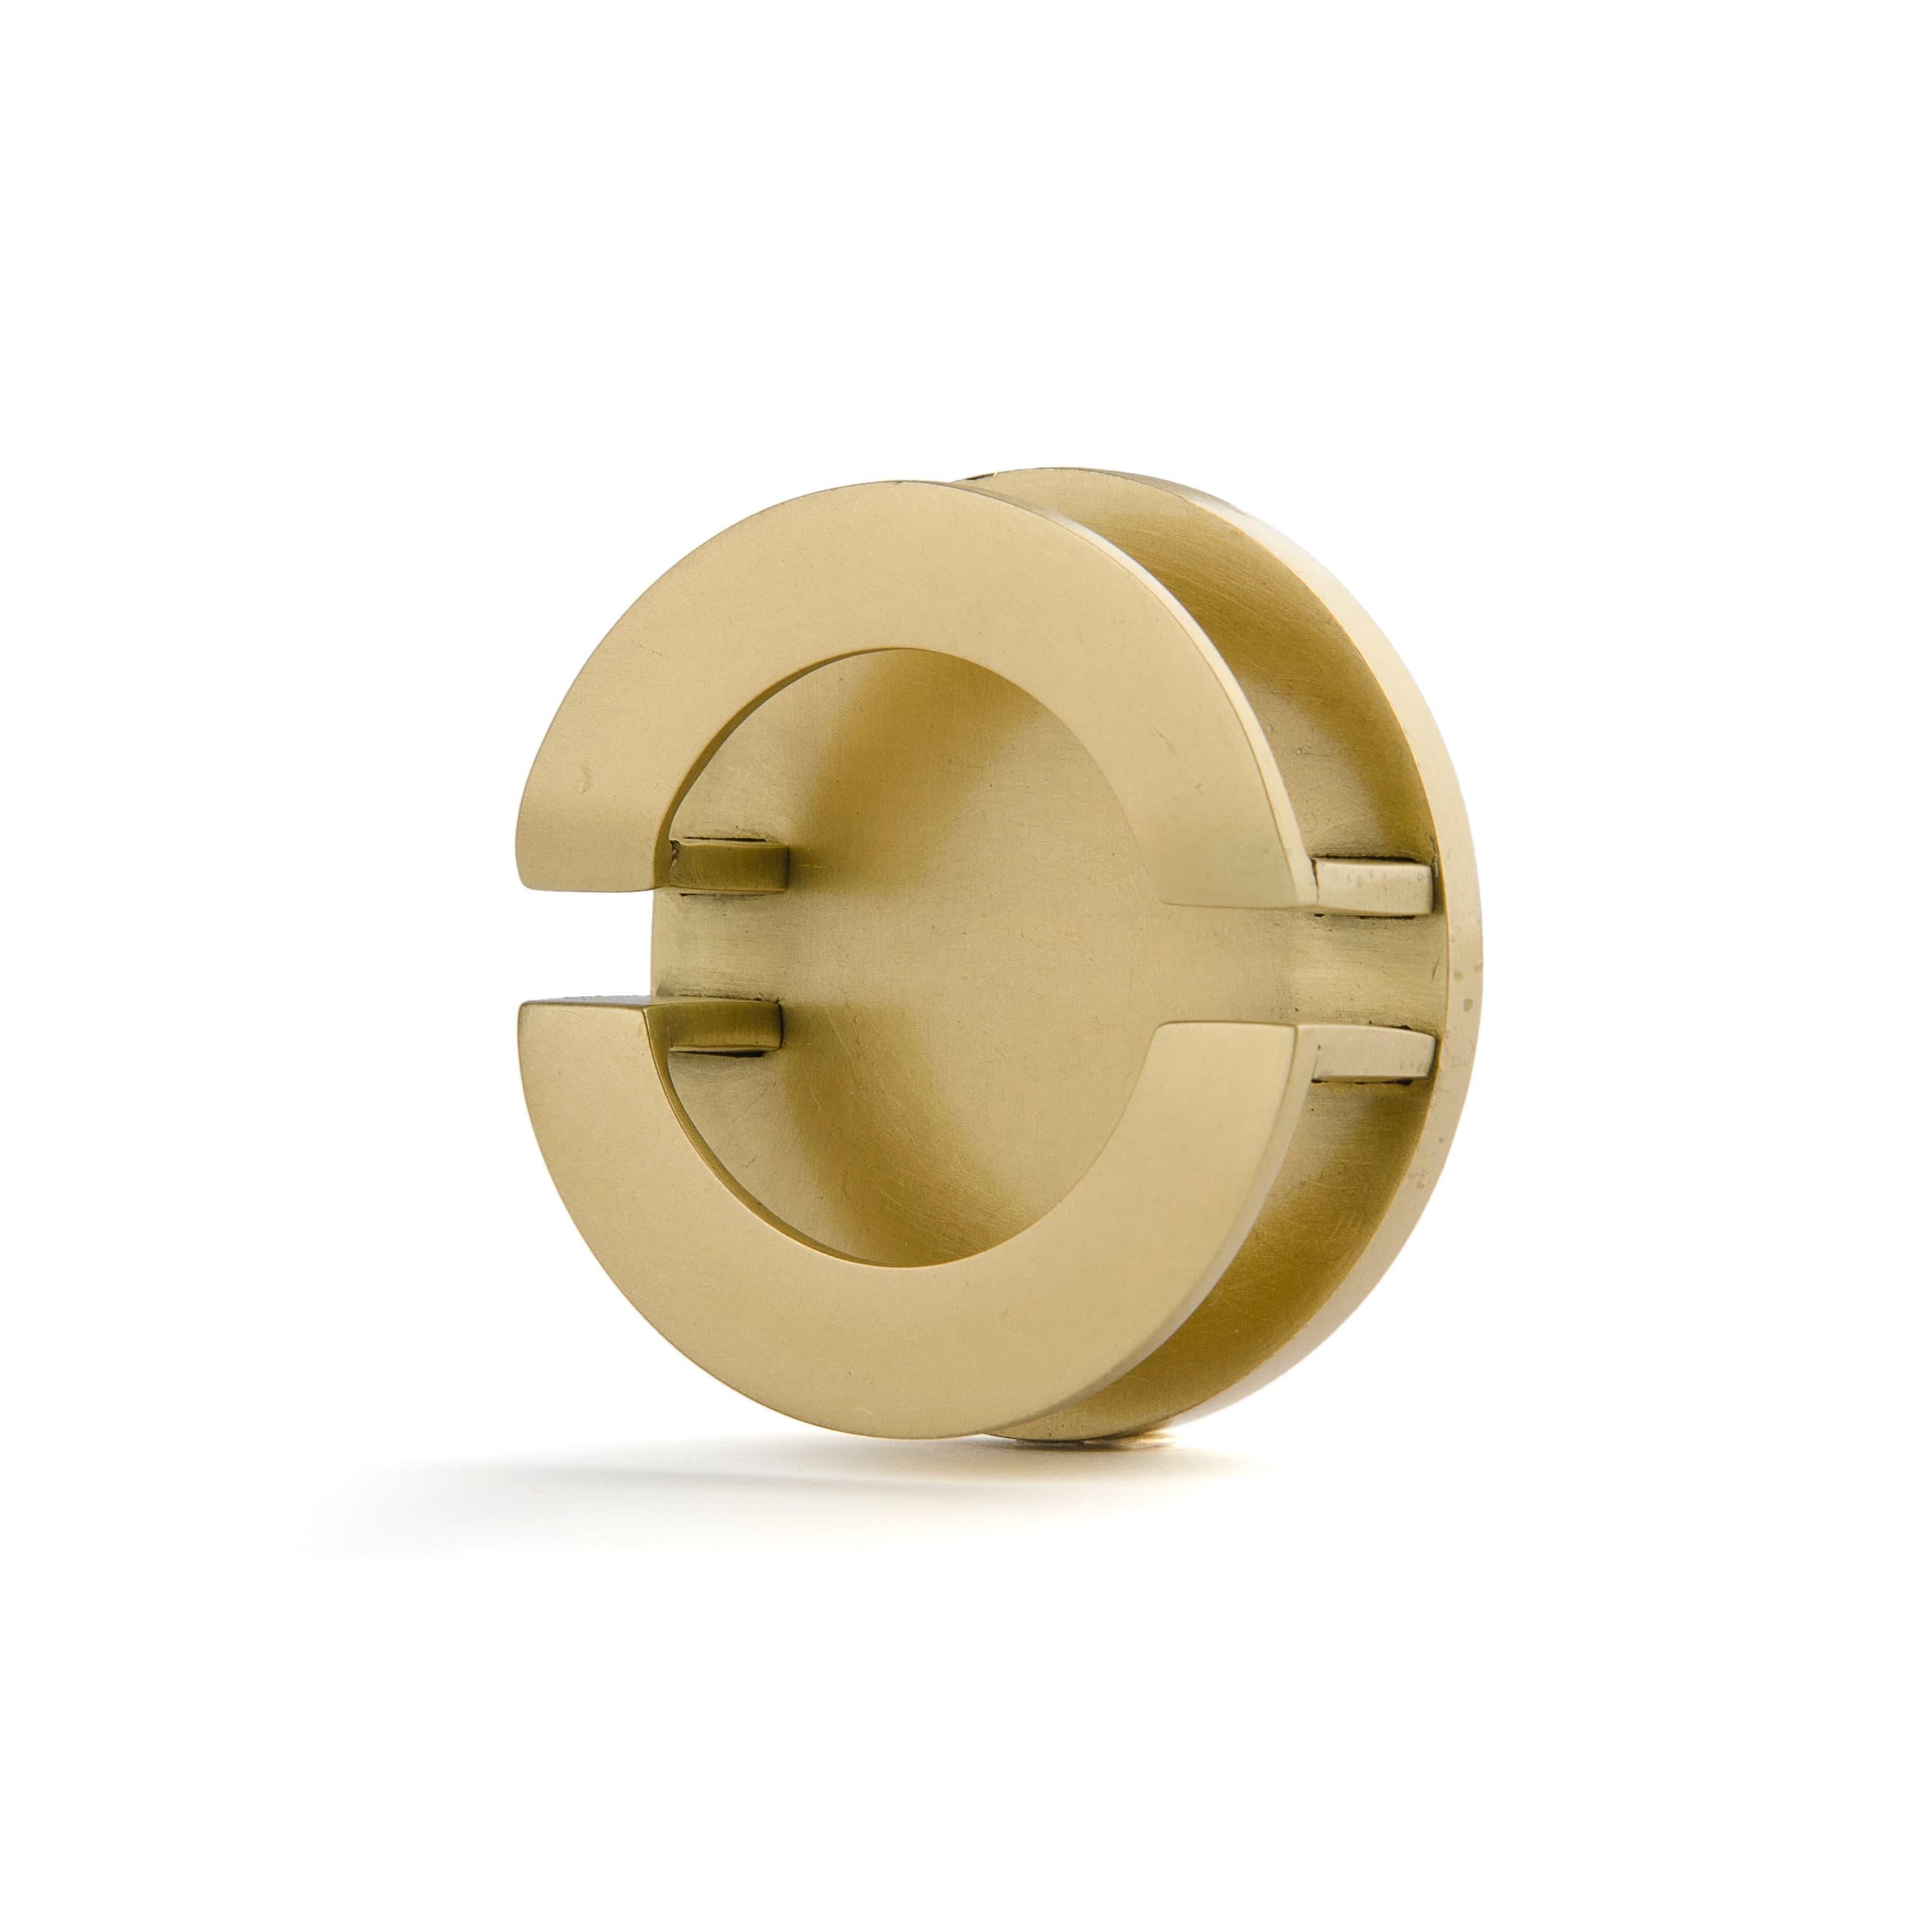 Фигурная ручка-кольцо R022 Any-Home - R022 | AnyHome.ru